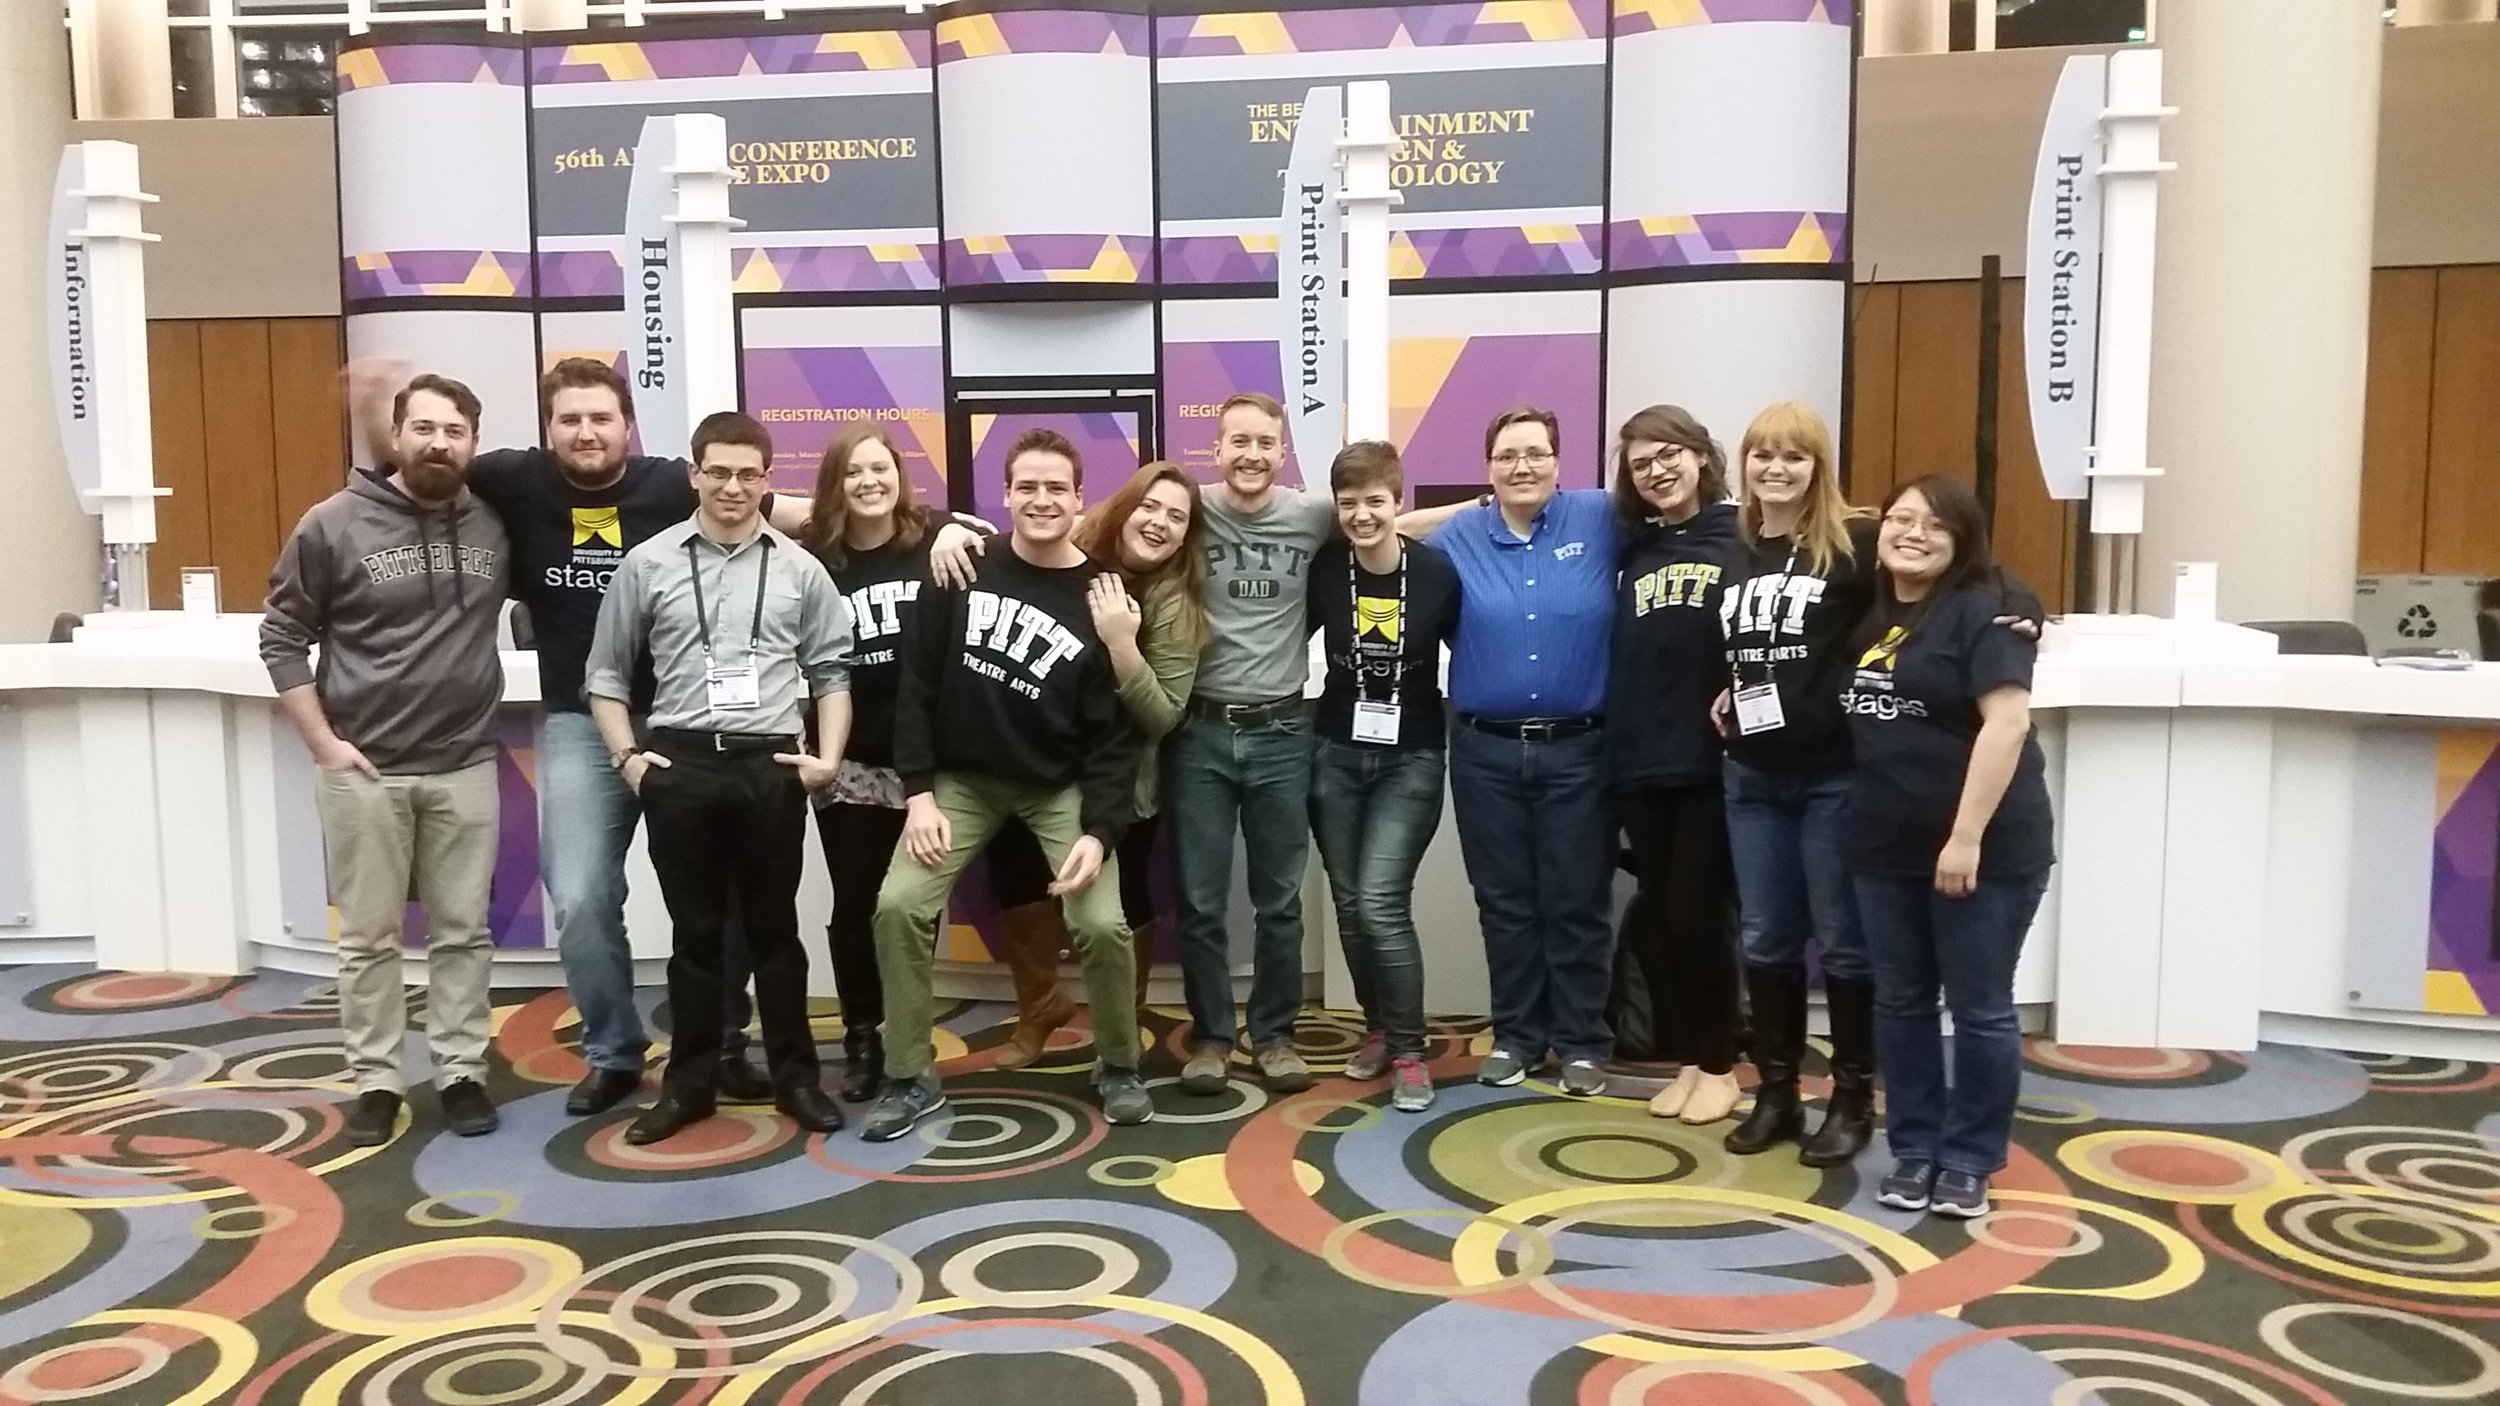 Pitt students, staff, faculty and alumni at USITT 2016 Salt Lake City.